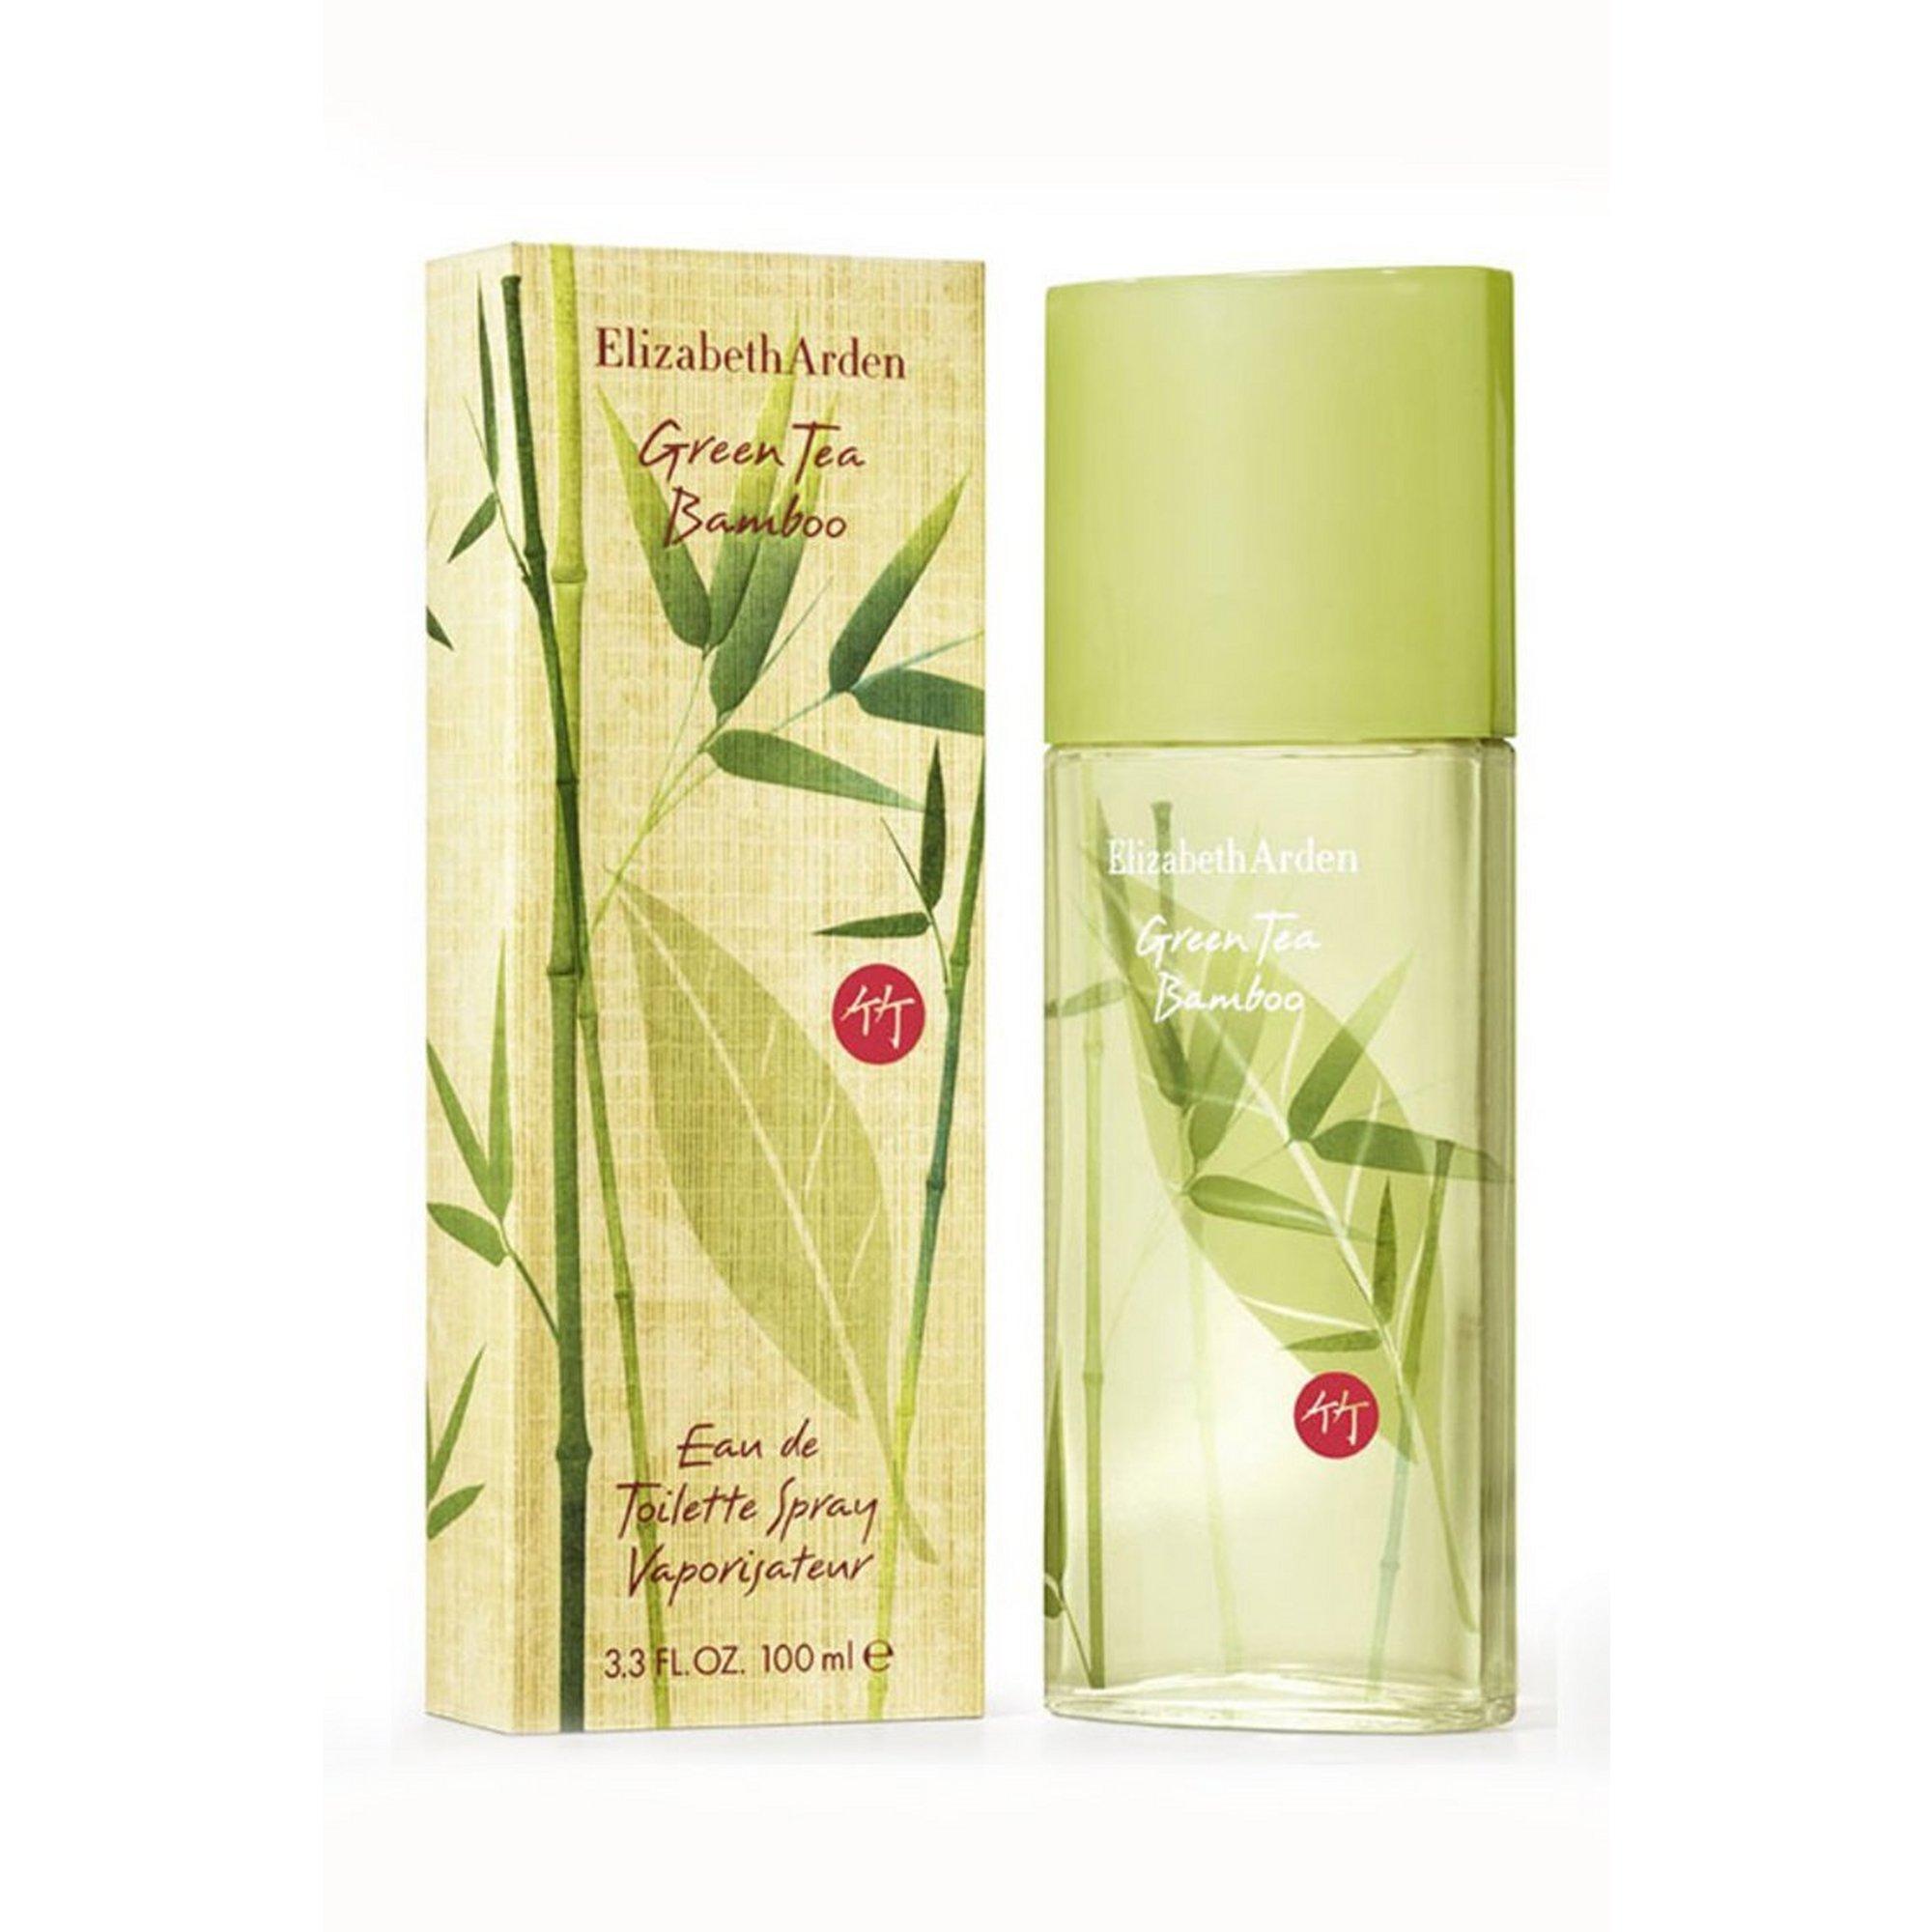 Image of Elizabeth Arden Green Tea Bamboo 100ml EDT Spray